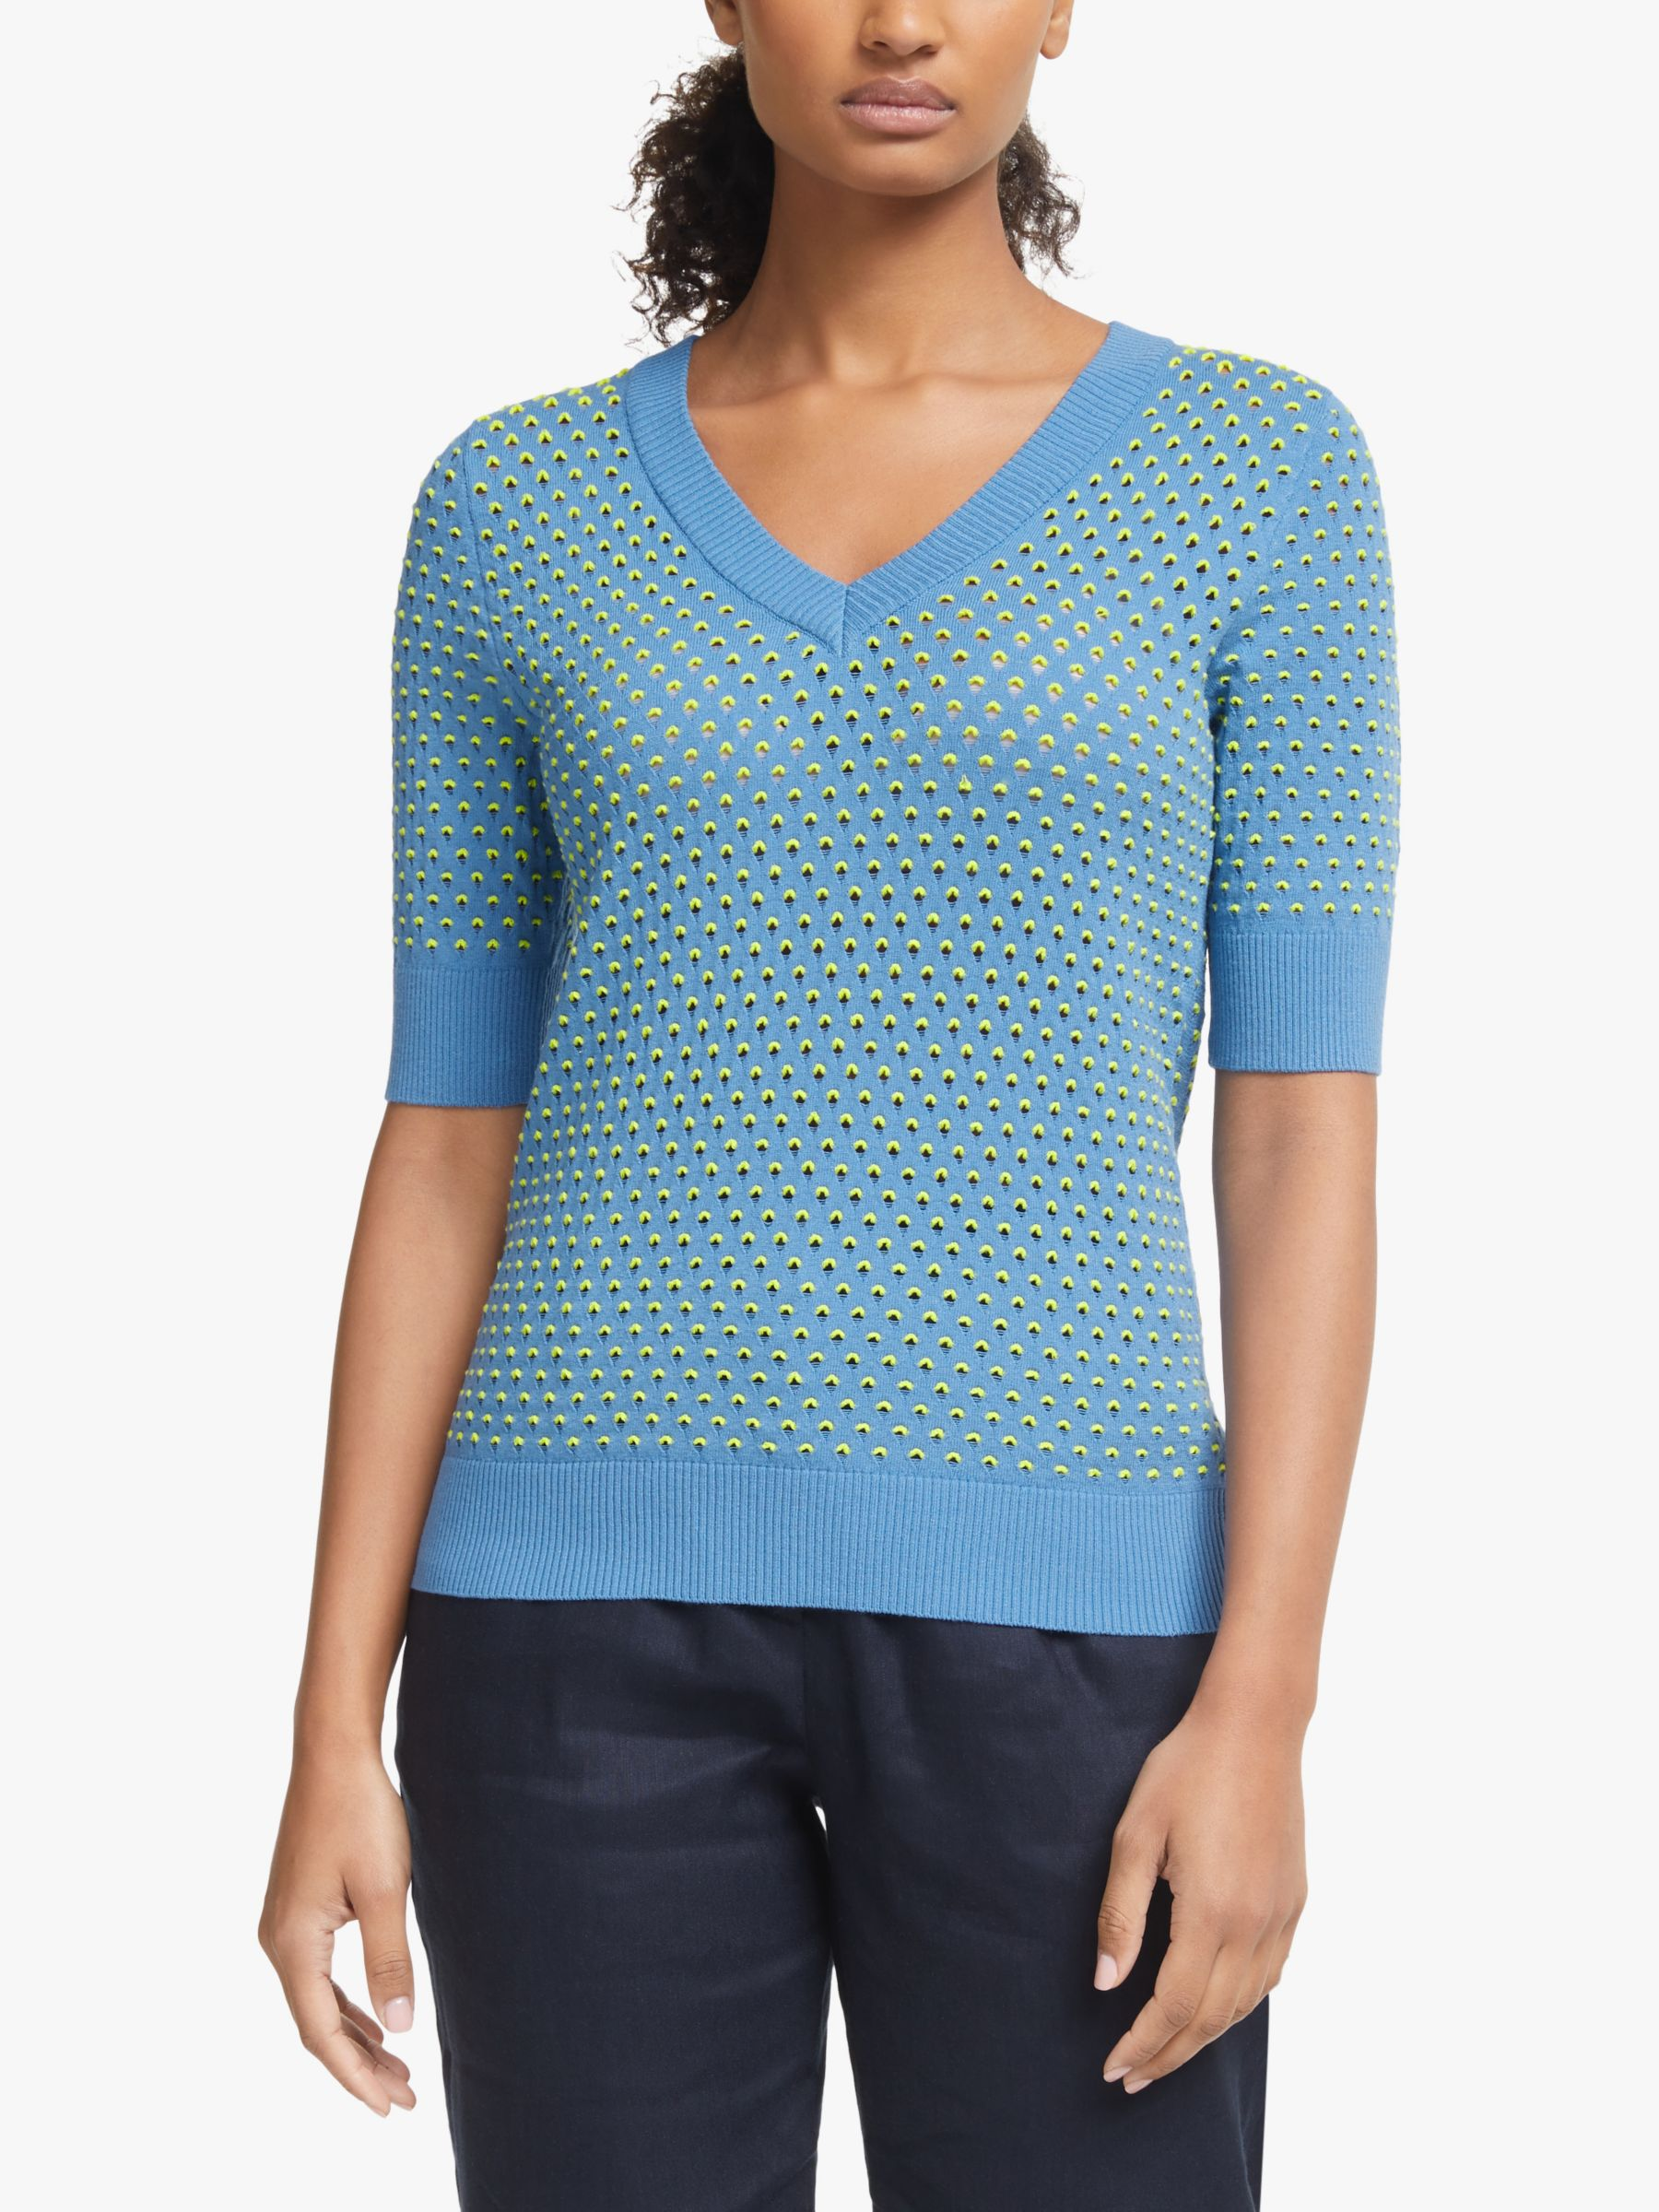 Numph Numph Nubrynn Textured Short Sleeve Knit